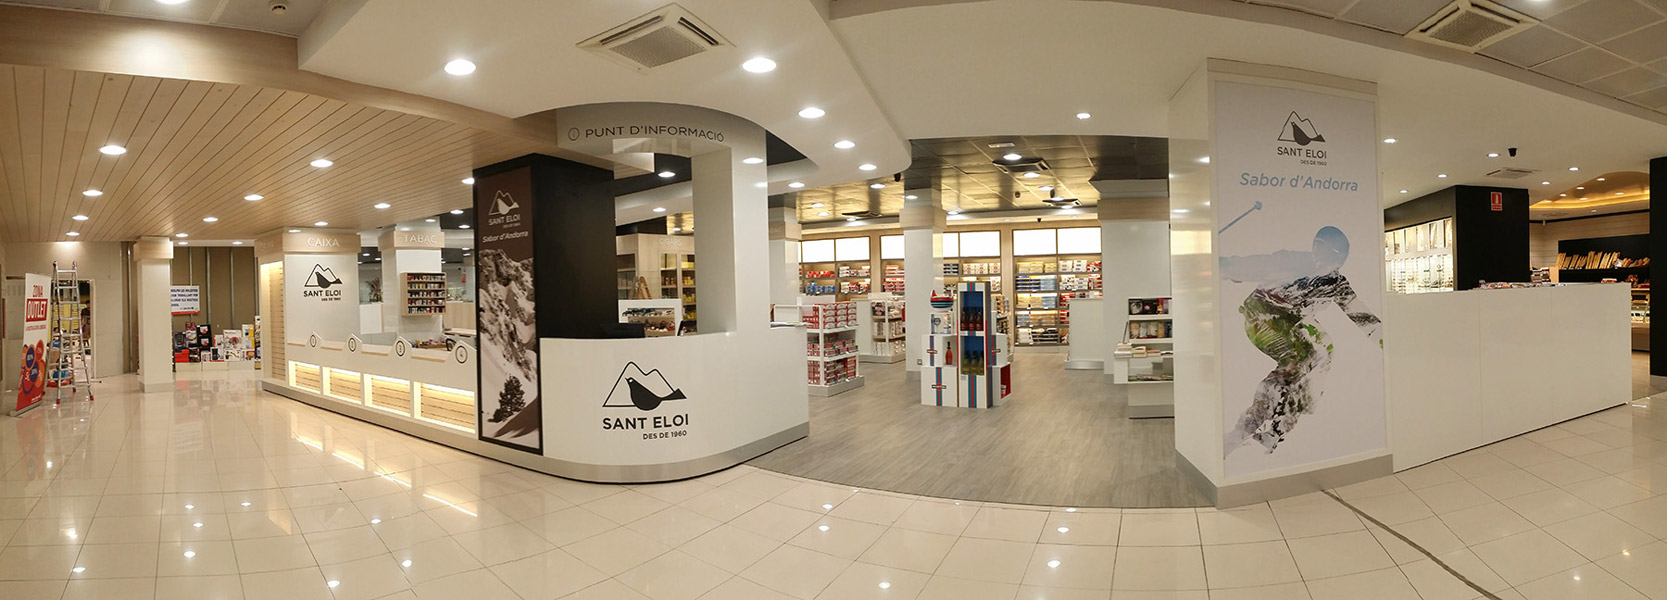 Morfus - Equipamiento Supermercados Sant Eloi